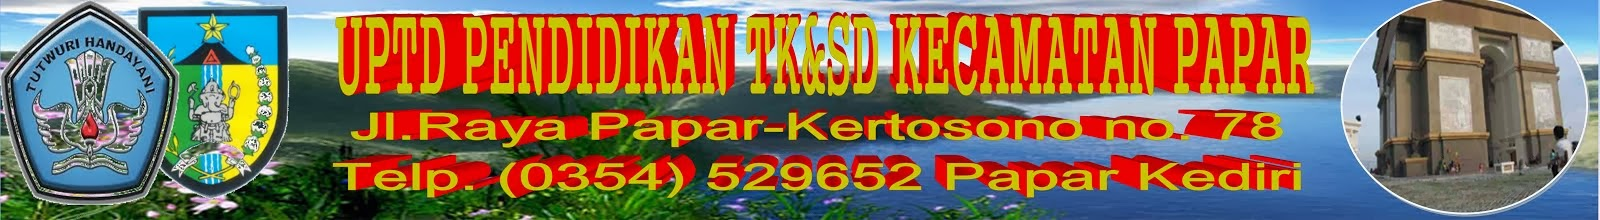 UPTD PENDIDIKAN TK&SD KEC.PAPAR Jl. Raya Papar   No.78       Telp. ( 0354 ) 529652-Papar Kediri